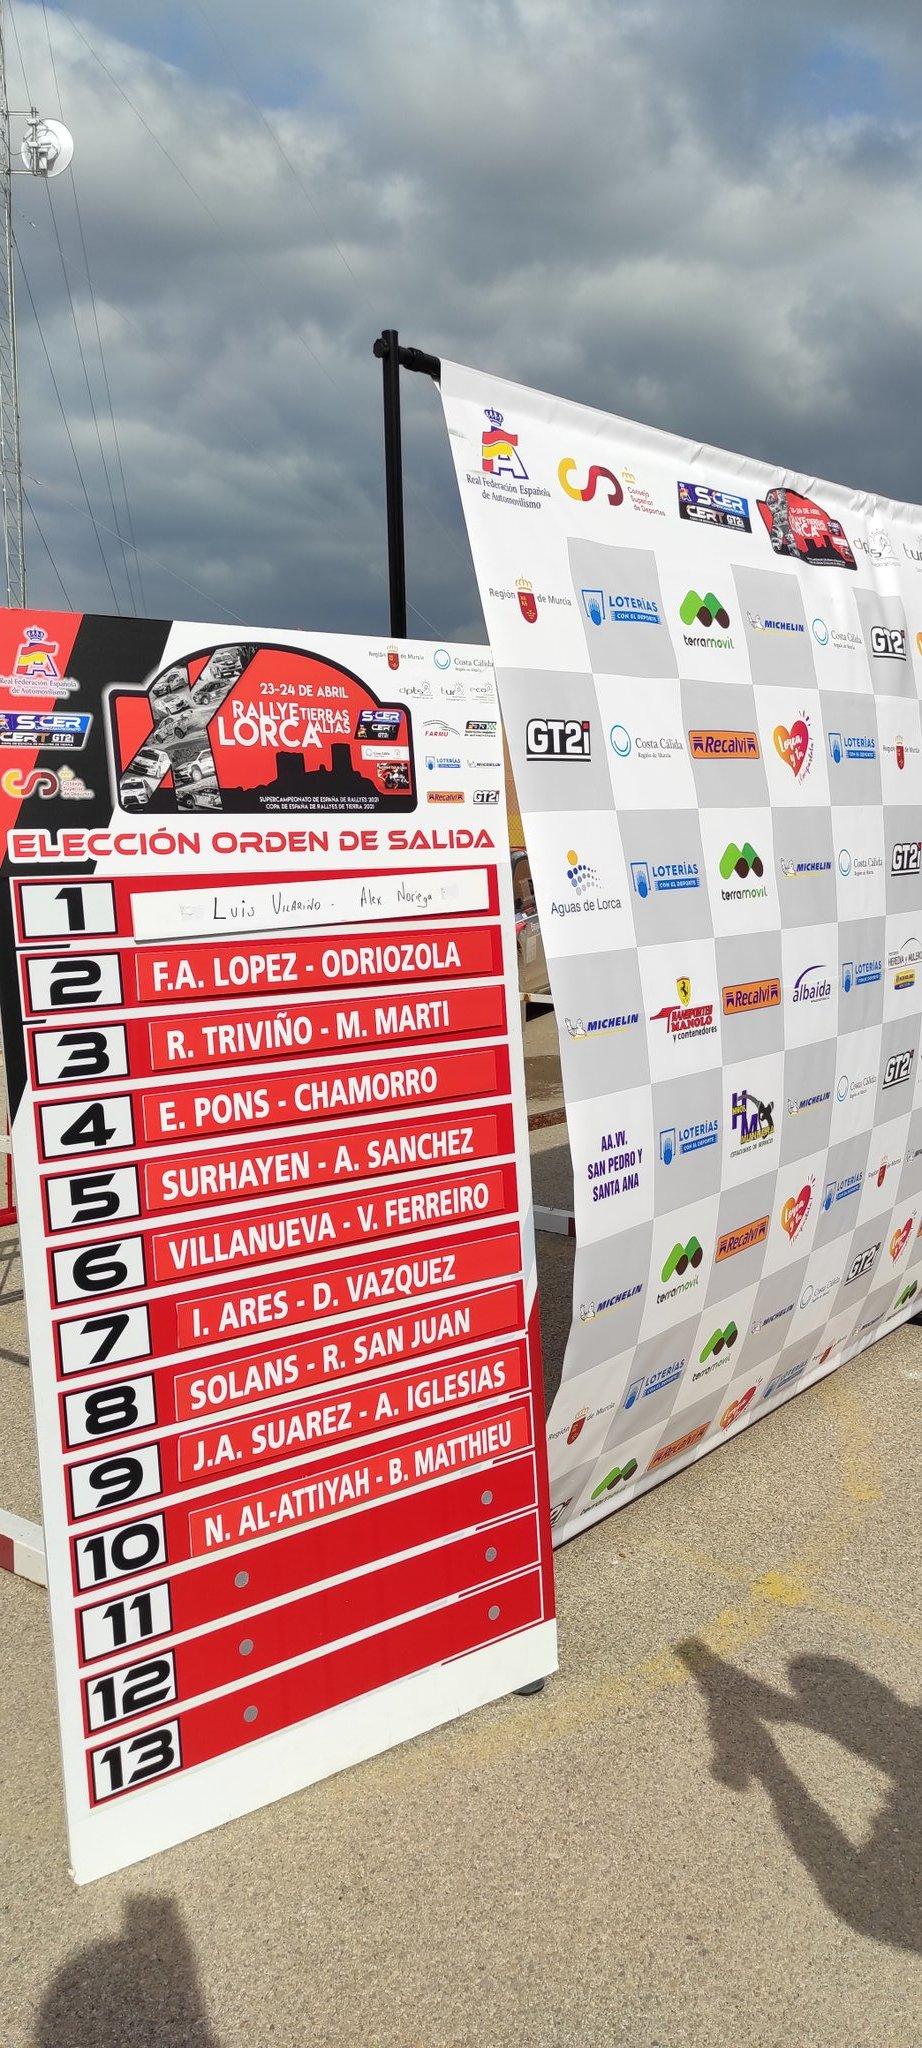 SCER + CERT: 10º Rallye Tierras Altas de Lorca [23-24 Abril] - Página 2 Ezq55FGX0AAB0Qi?format=jpg&name=large